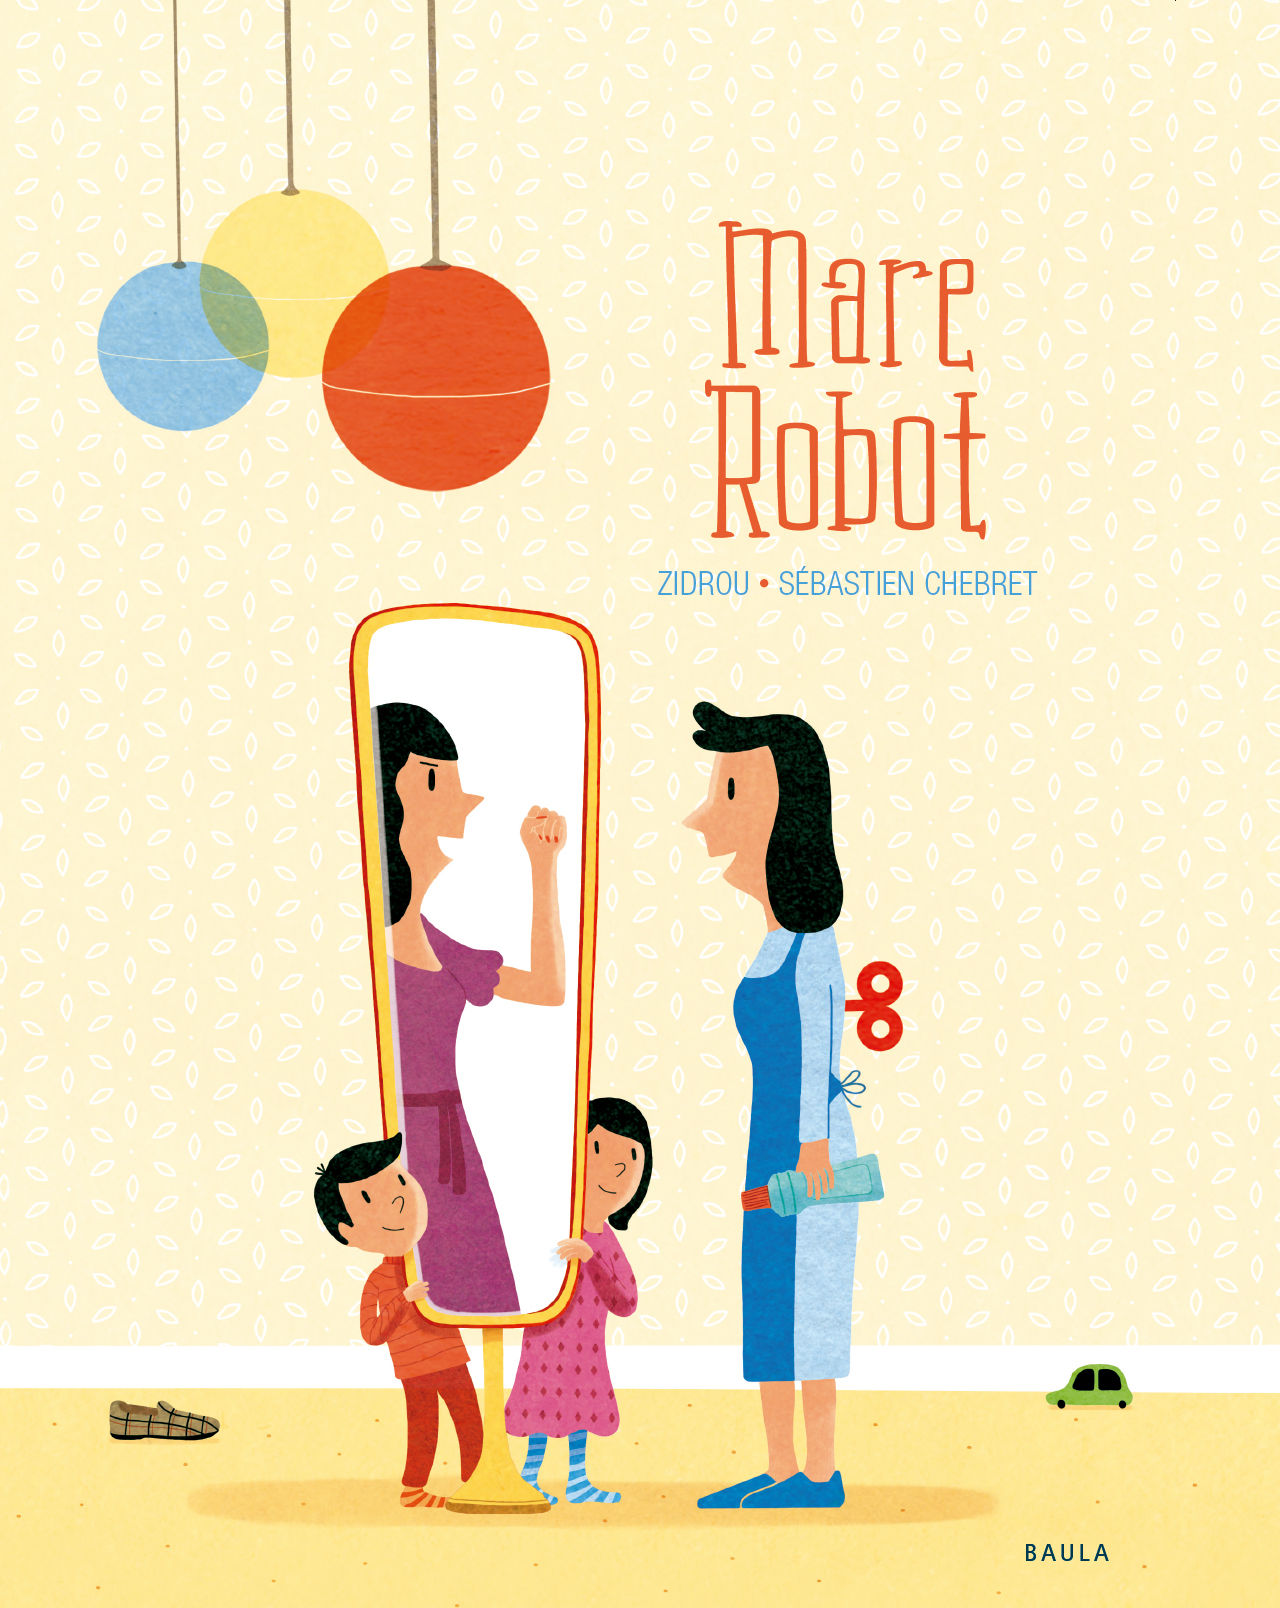 MARE ROBOT